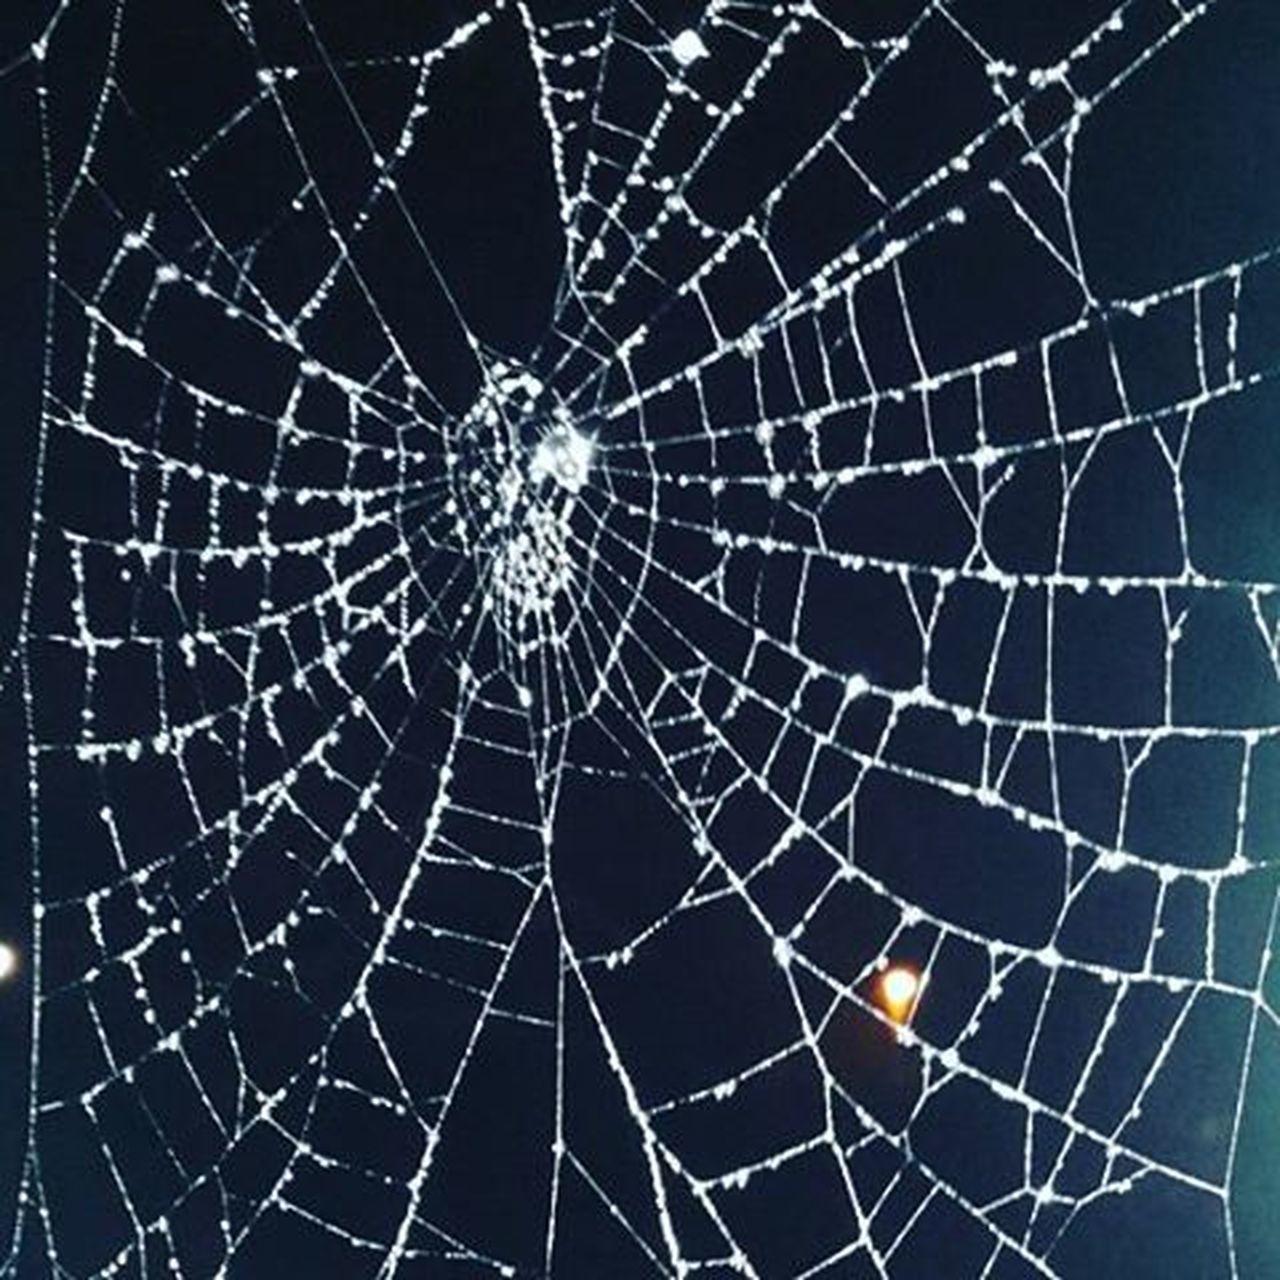 Im petrified of spiders but they make pretty cobwebs!Talentedeightleggedfreaks